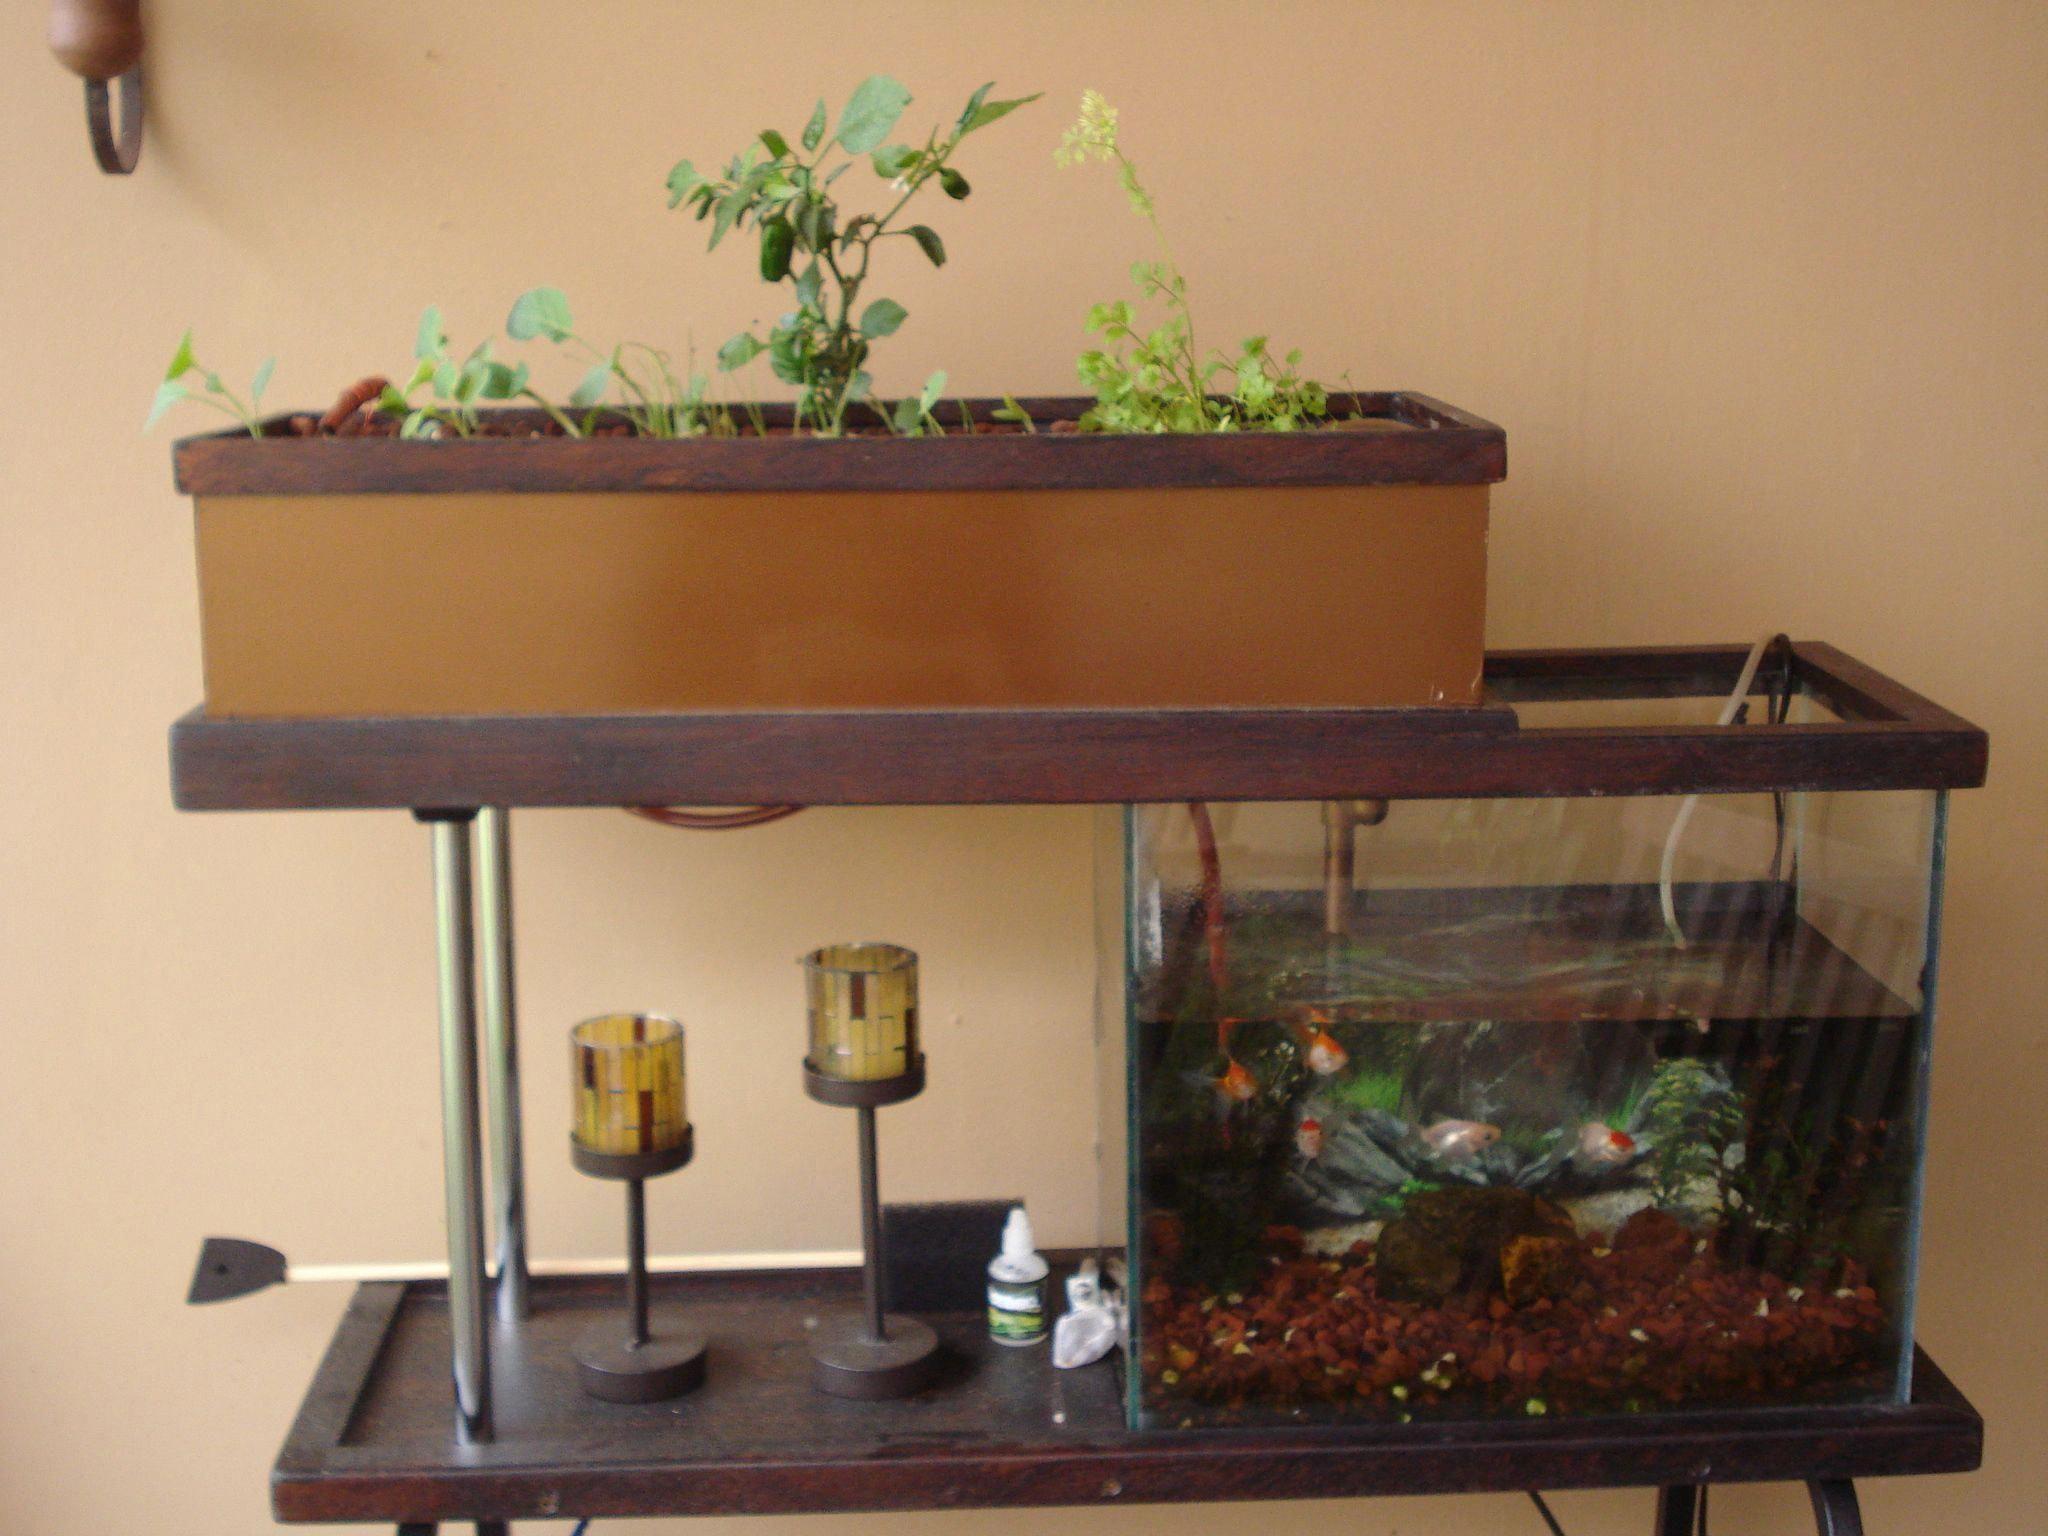 Aquaponics fish tank kit id1587219653 grapecaregrowing